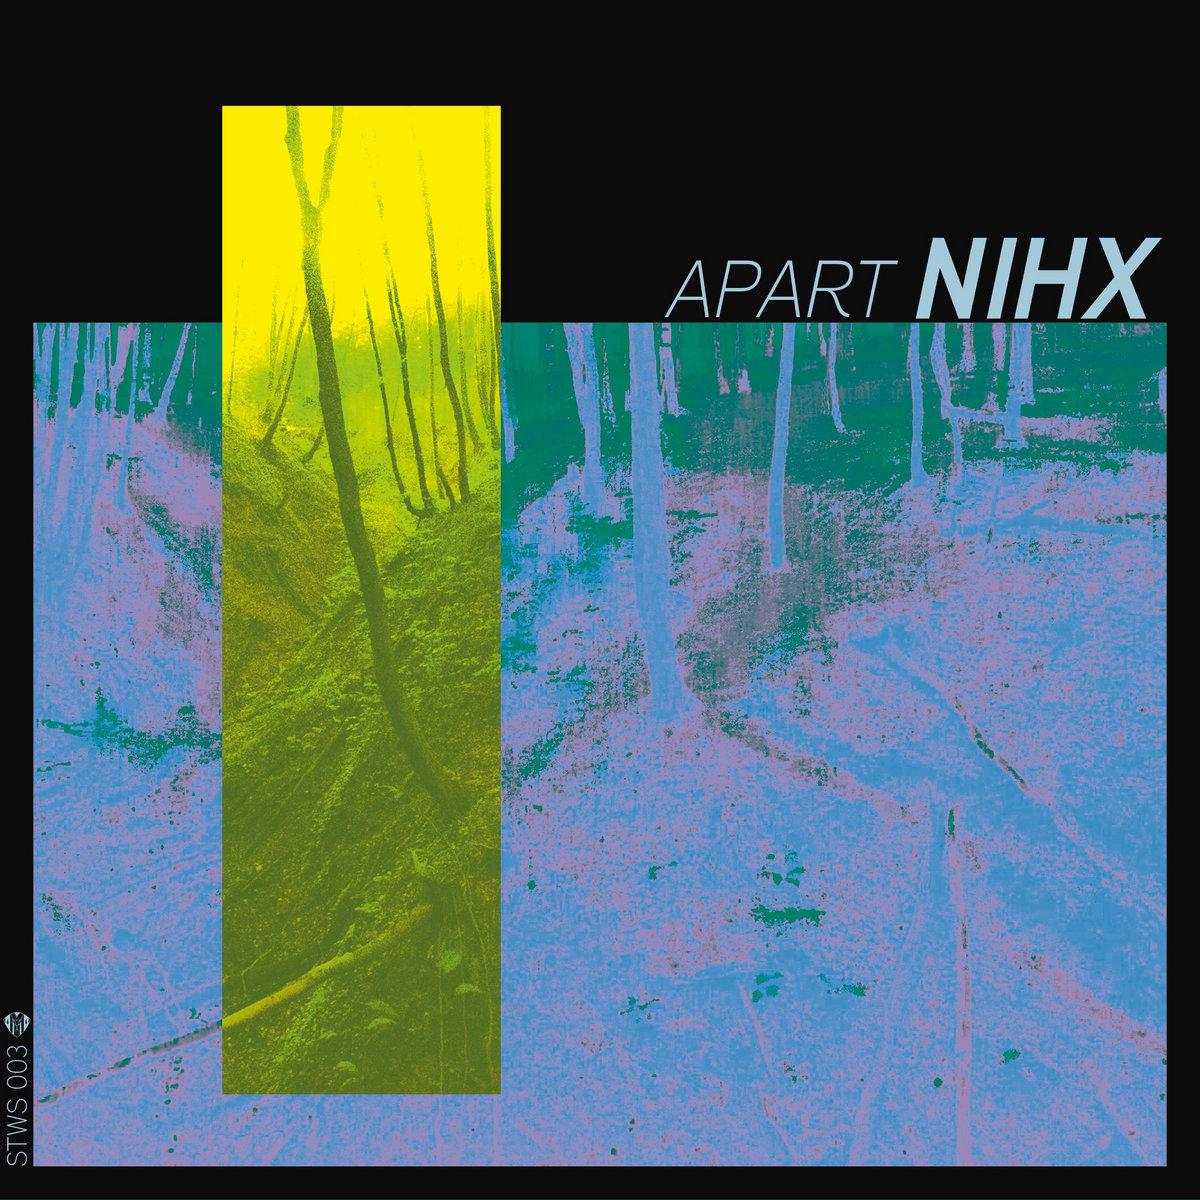 Nihx by Apart